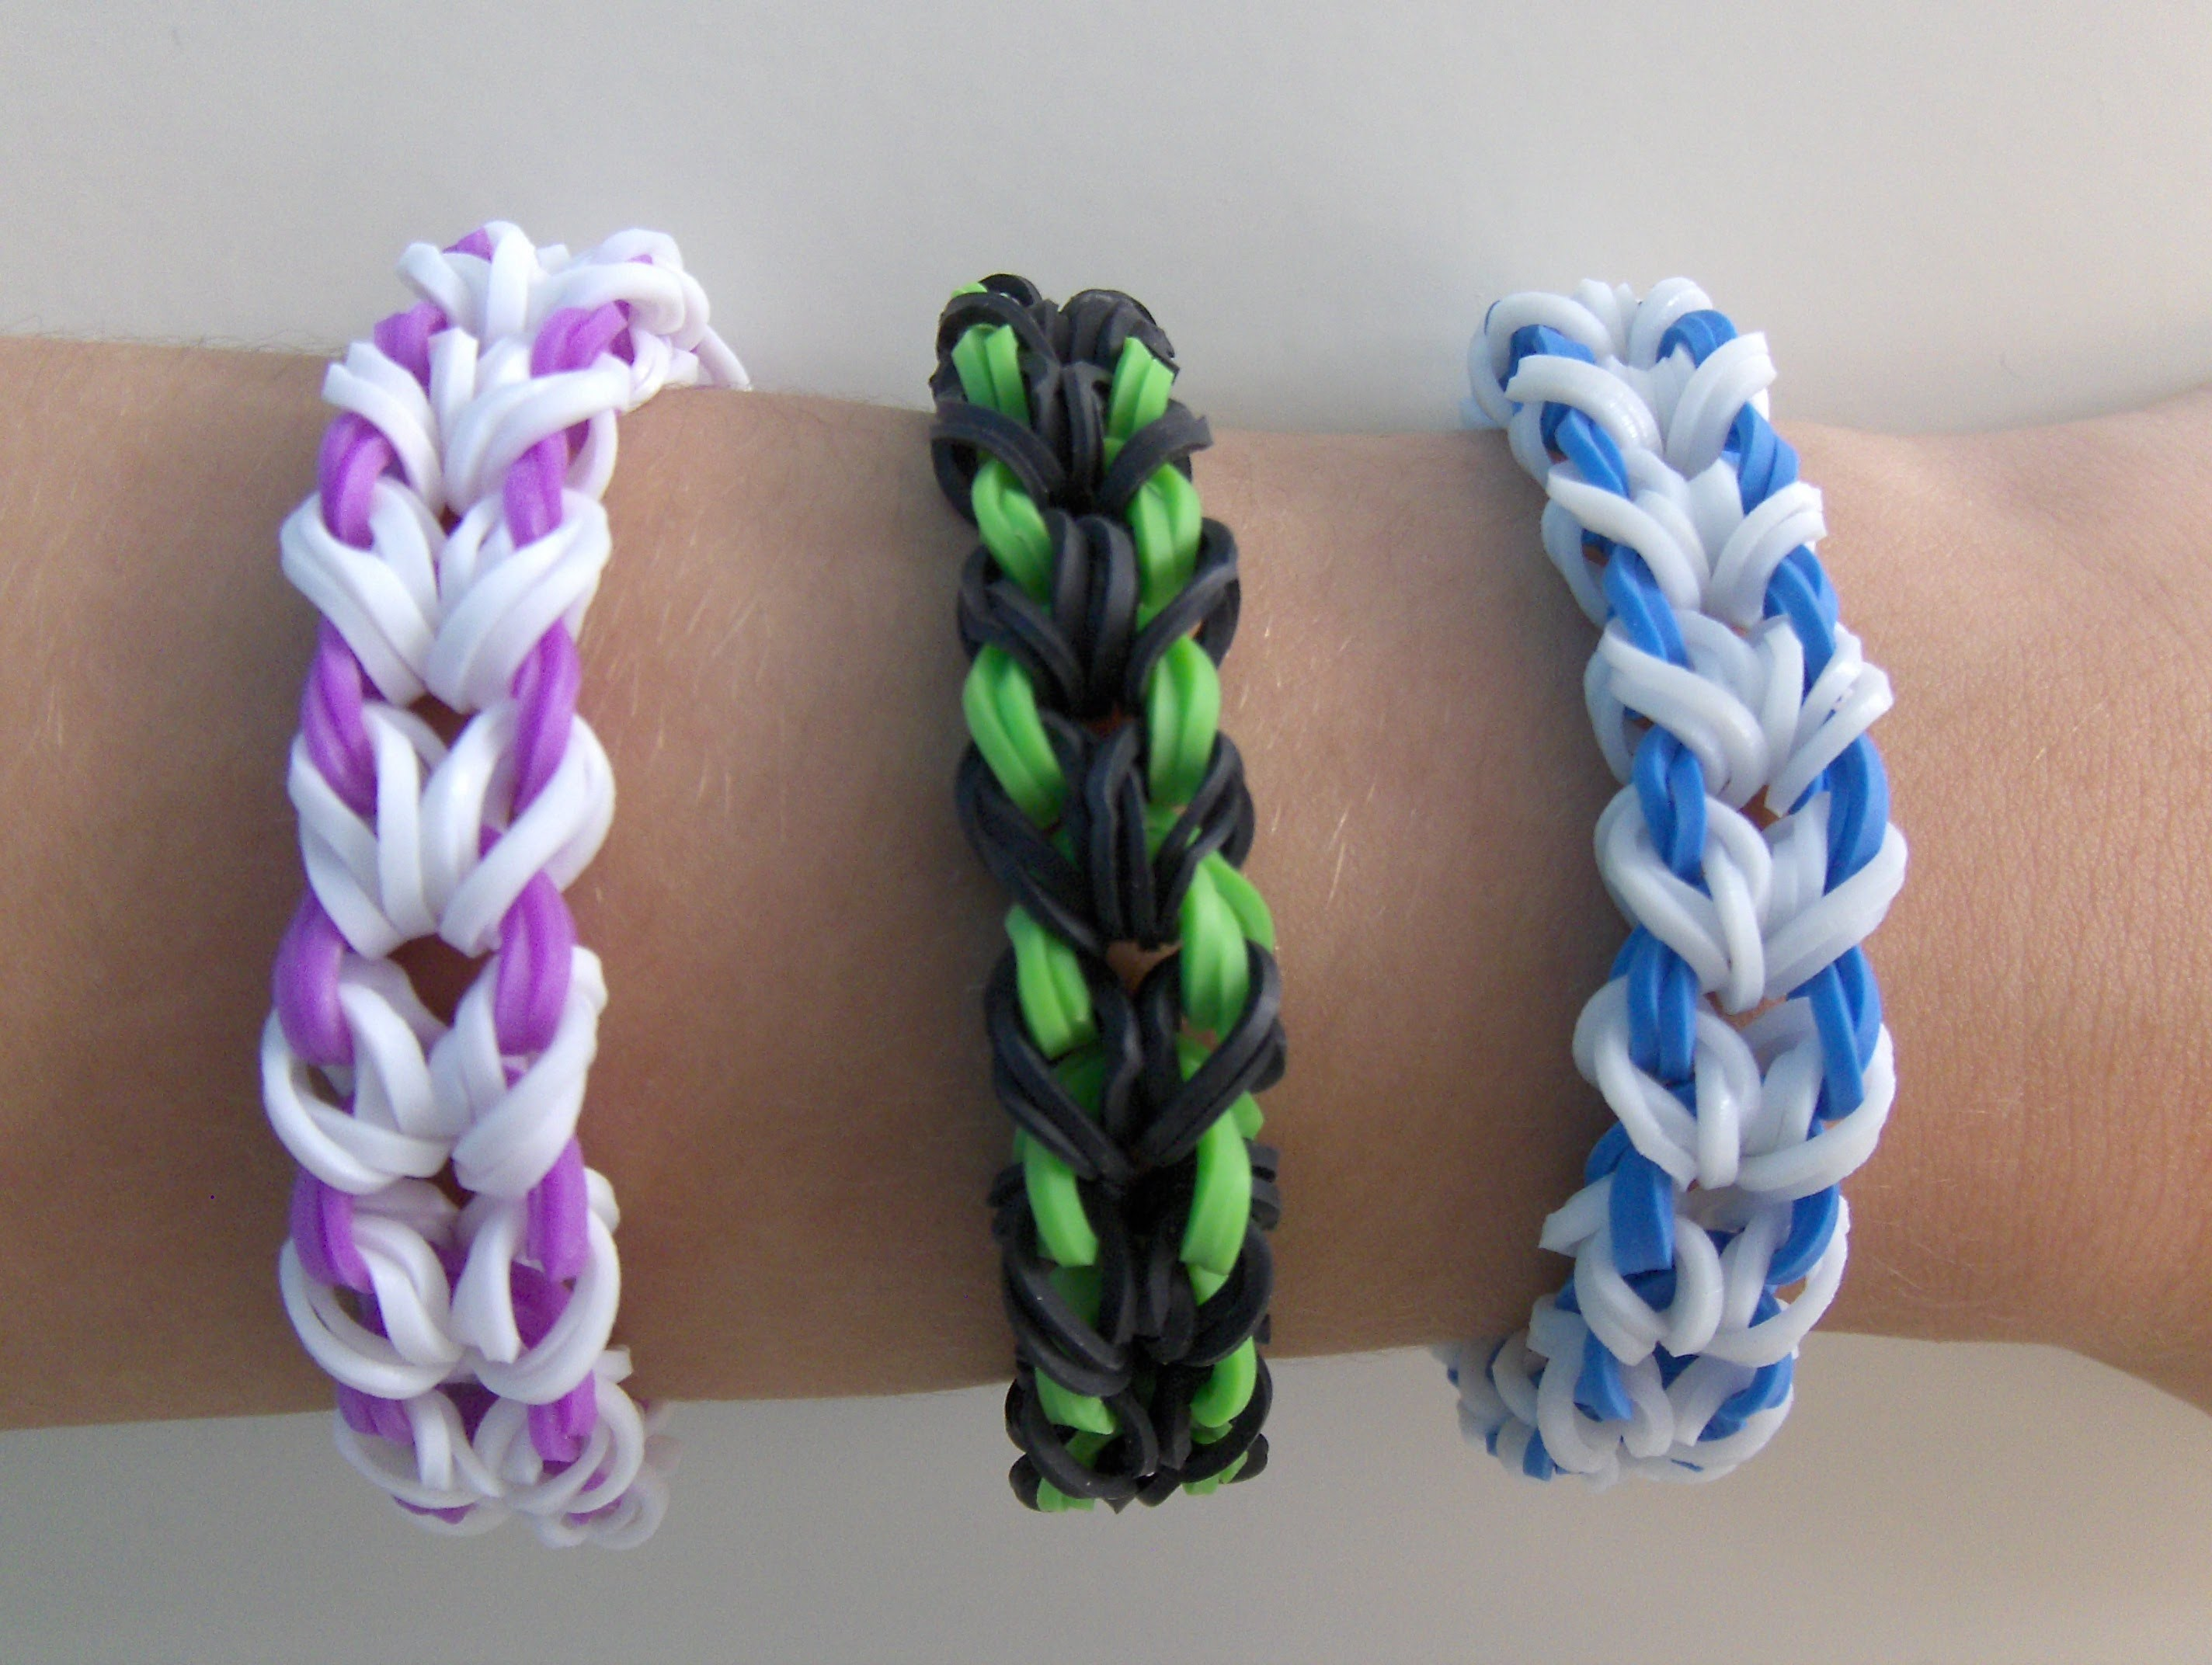 Rainbow Loom Nederlands, Miami Armband. Miami Bracelet